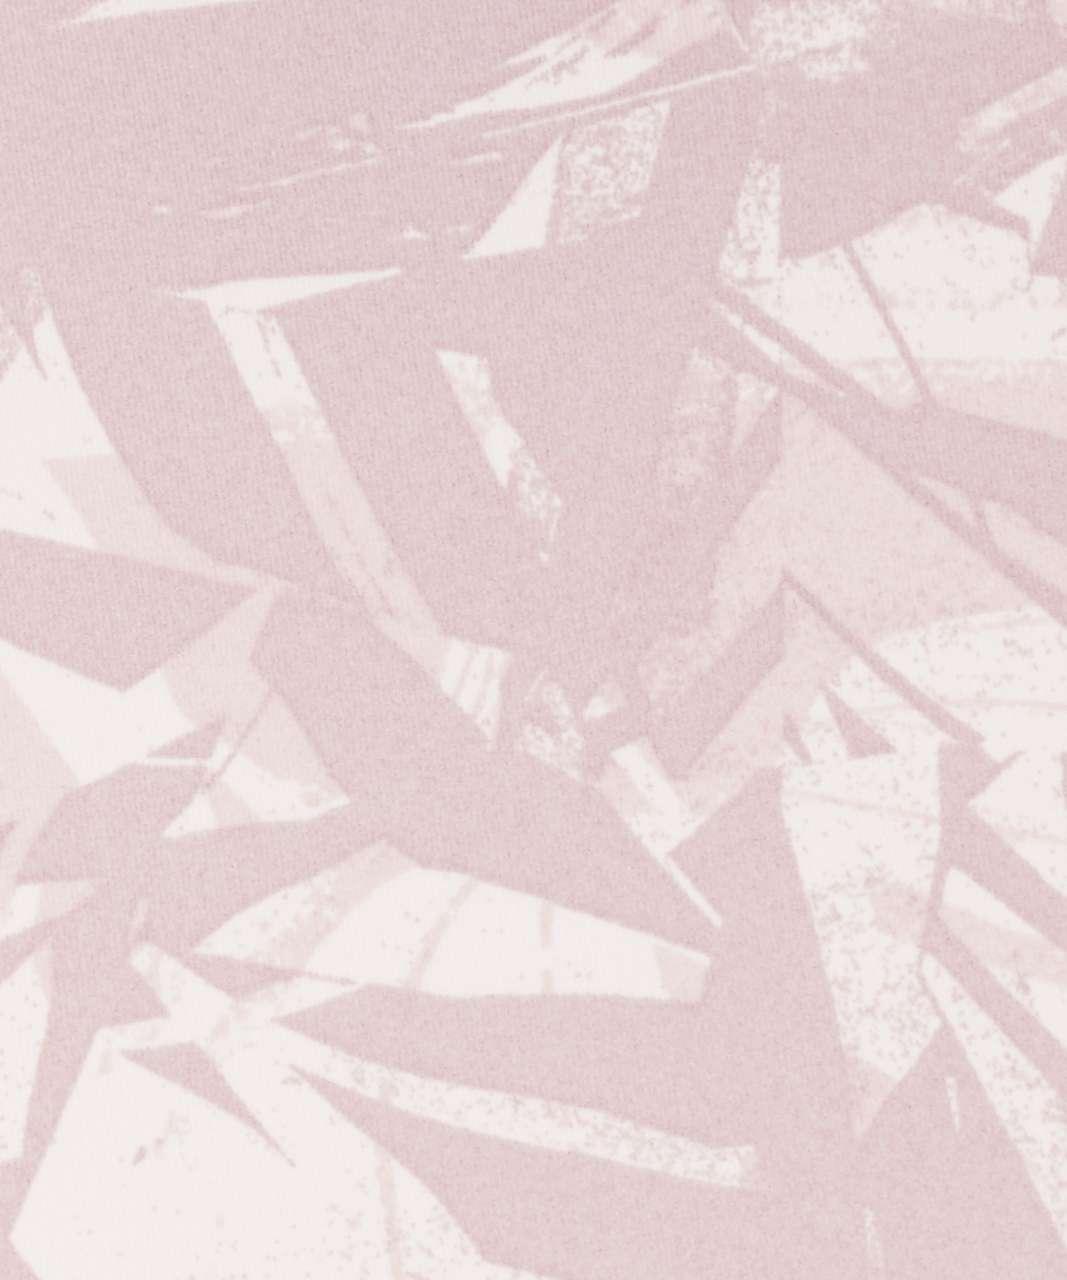 "Lululemon Wunder Under Crop (High-Rise) *Full-On Luxtreme 21"" - Shadow Leaf Light Ivory Muse / Light Ivory"